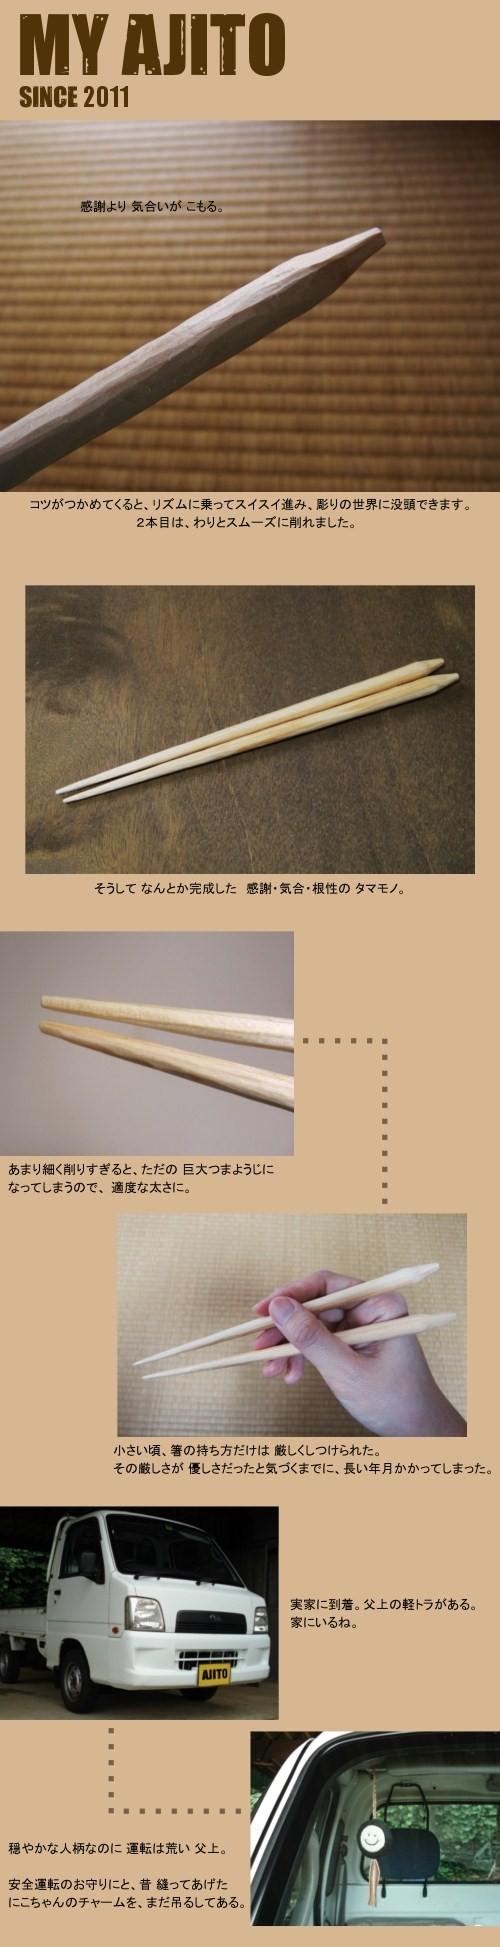 hashi_02.jpg